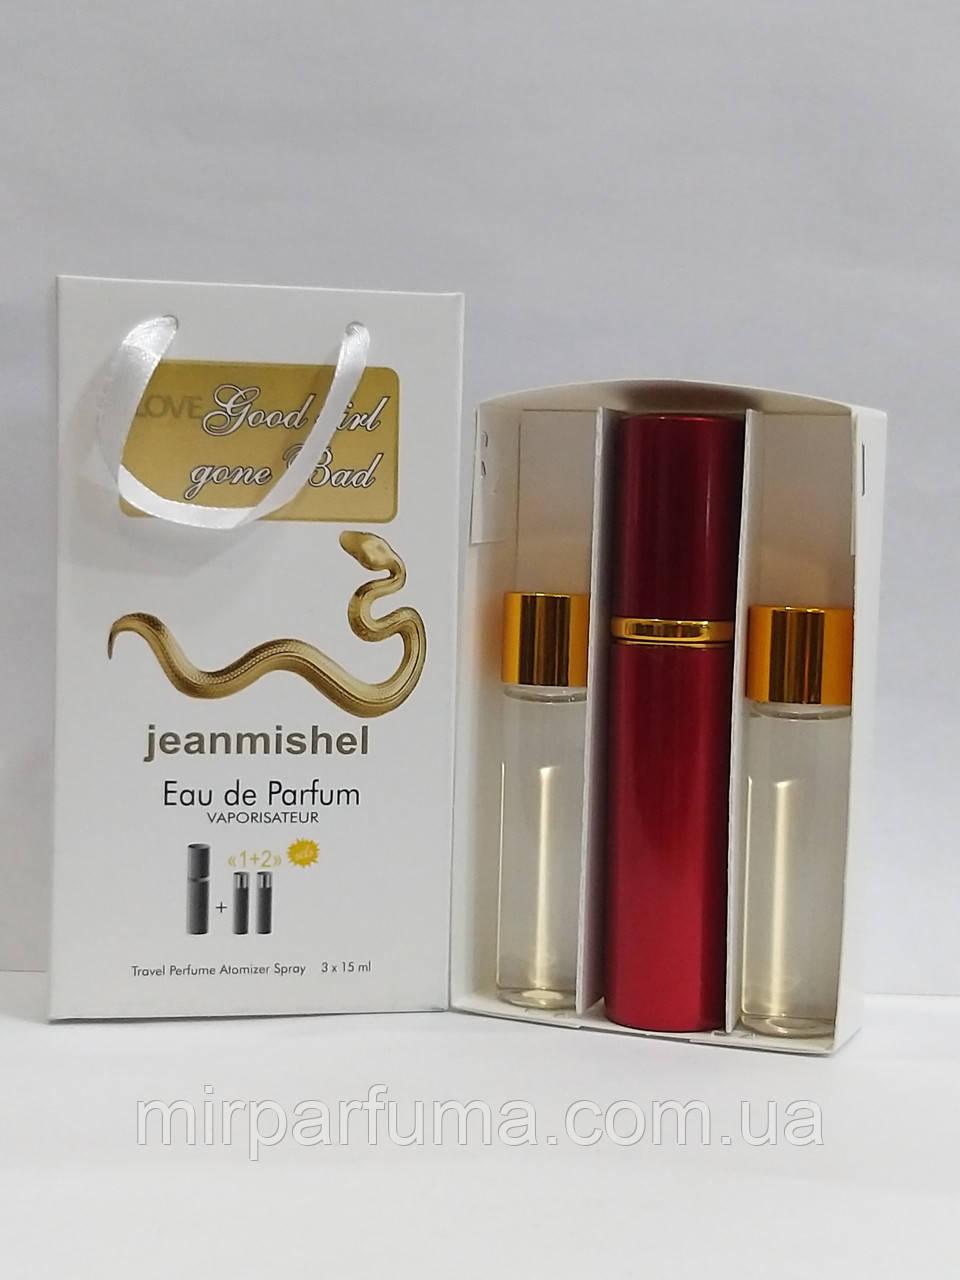 Мини парфюм jeanmishel Love Be Delicious Woman 45ml